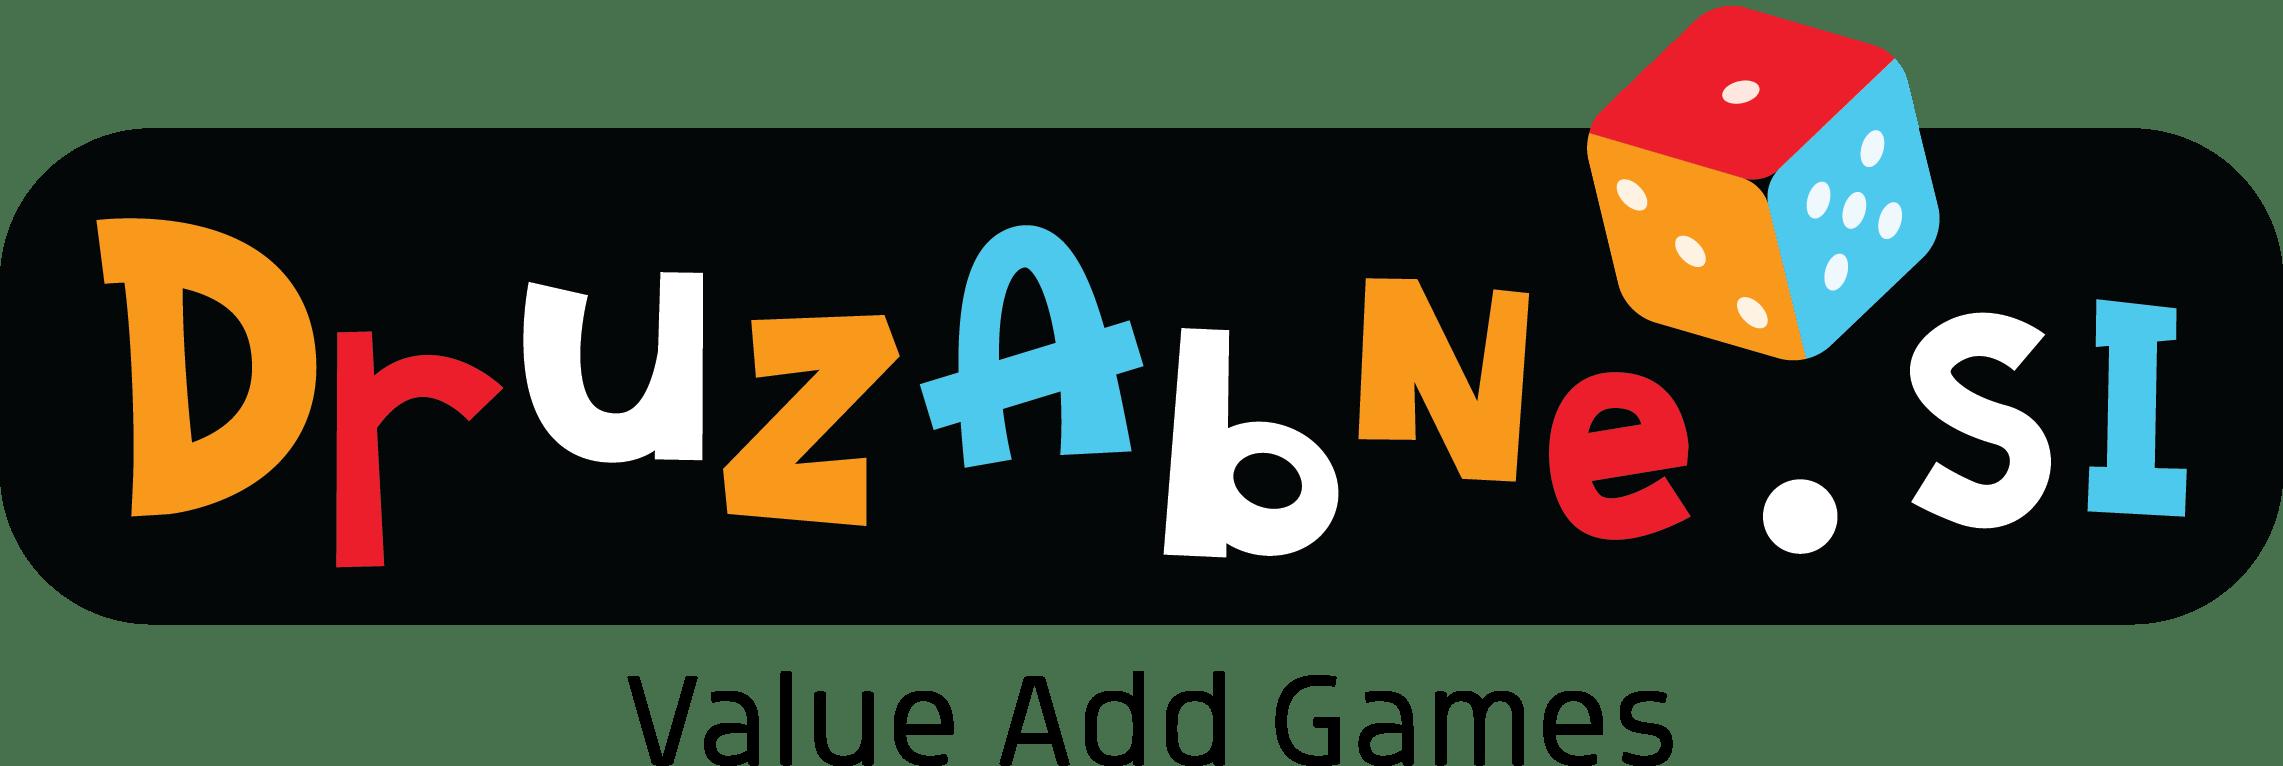 Value Add Games Shop